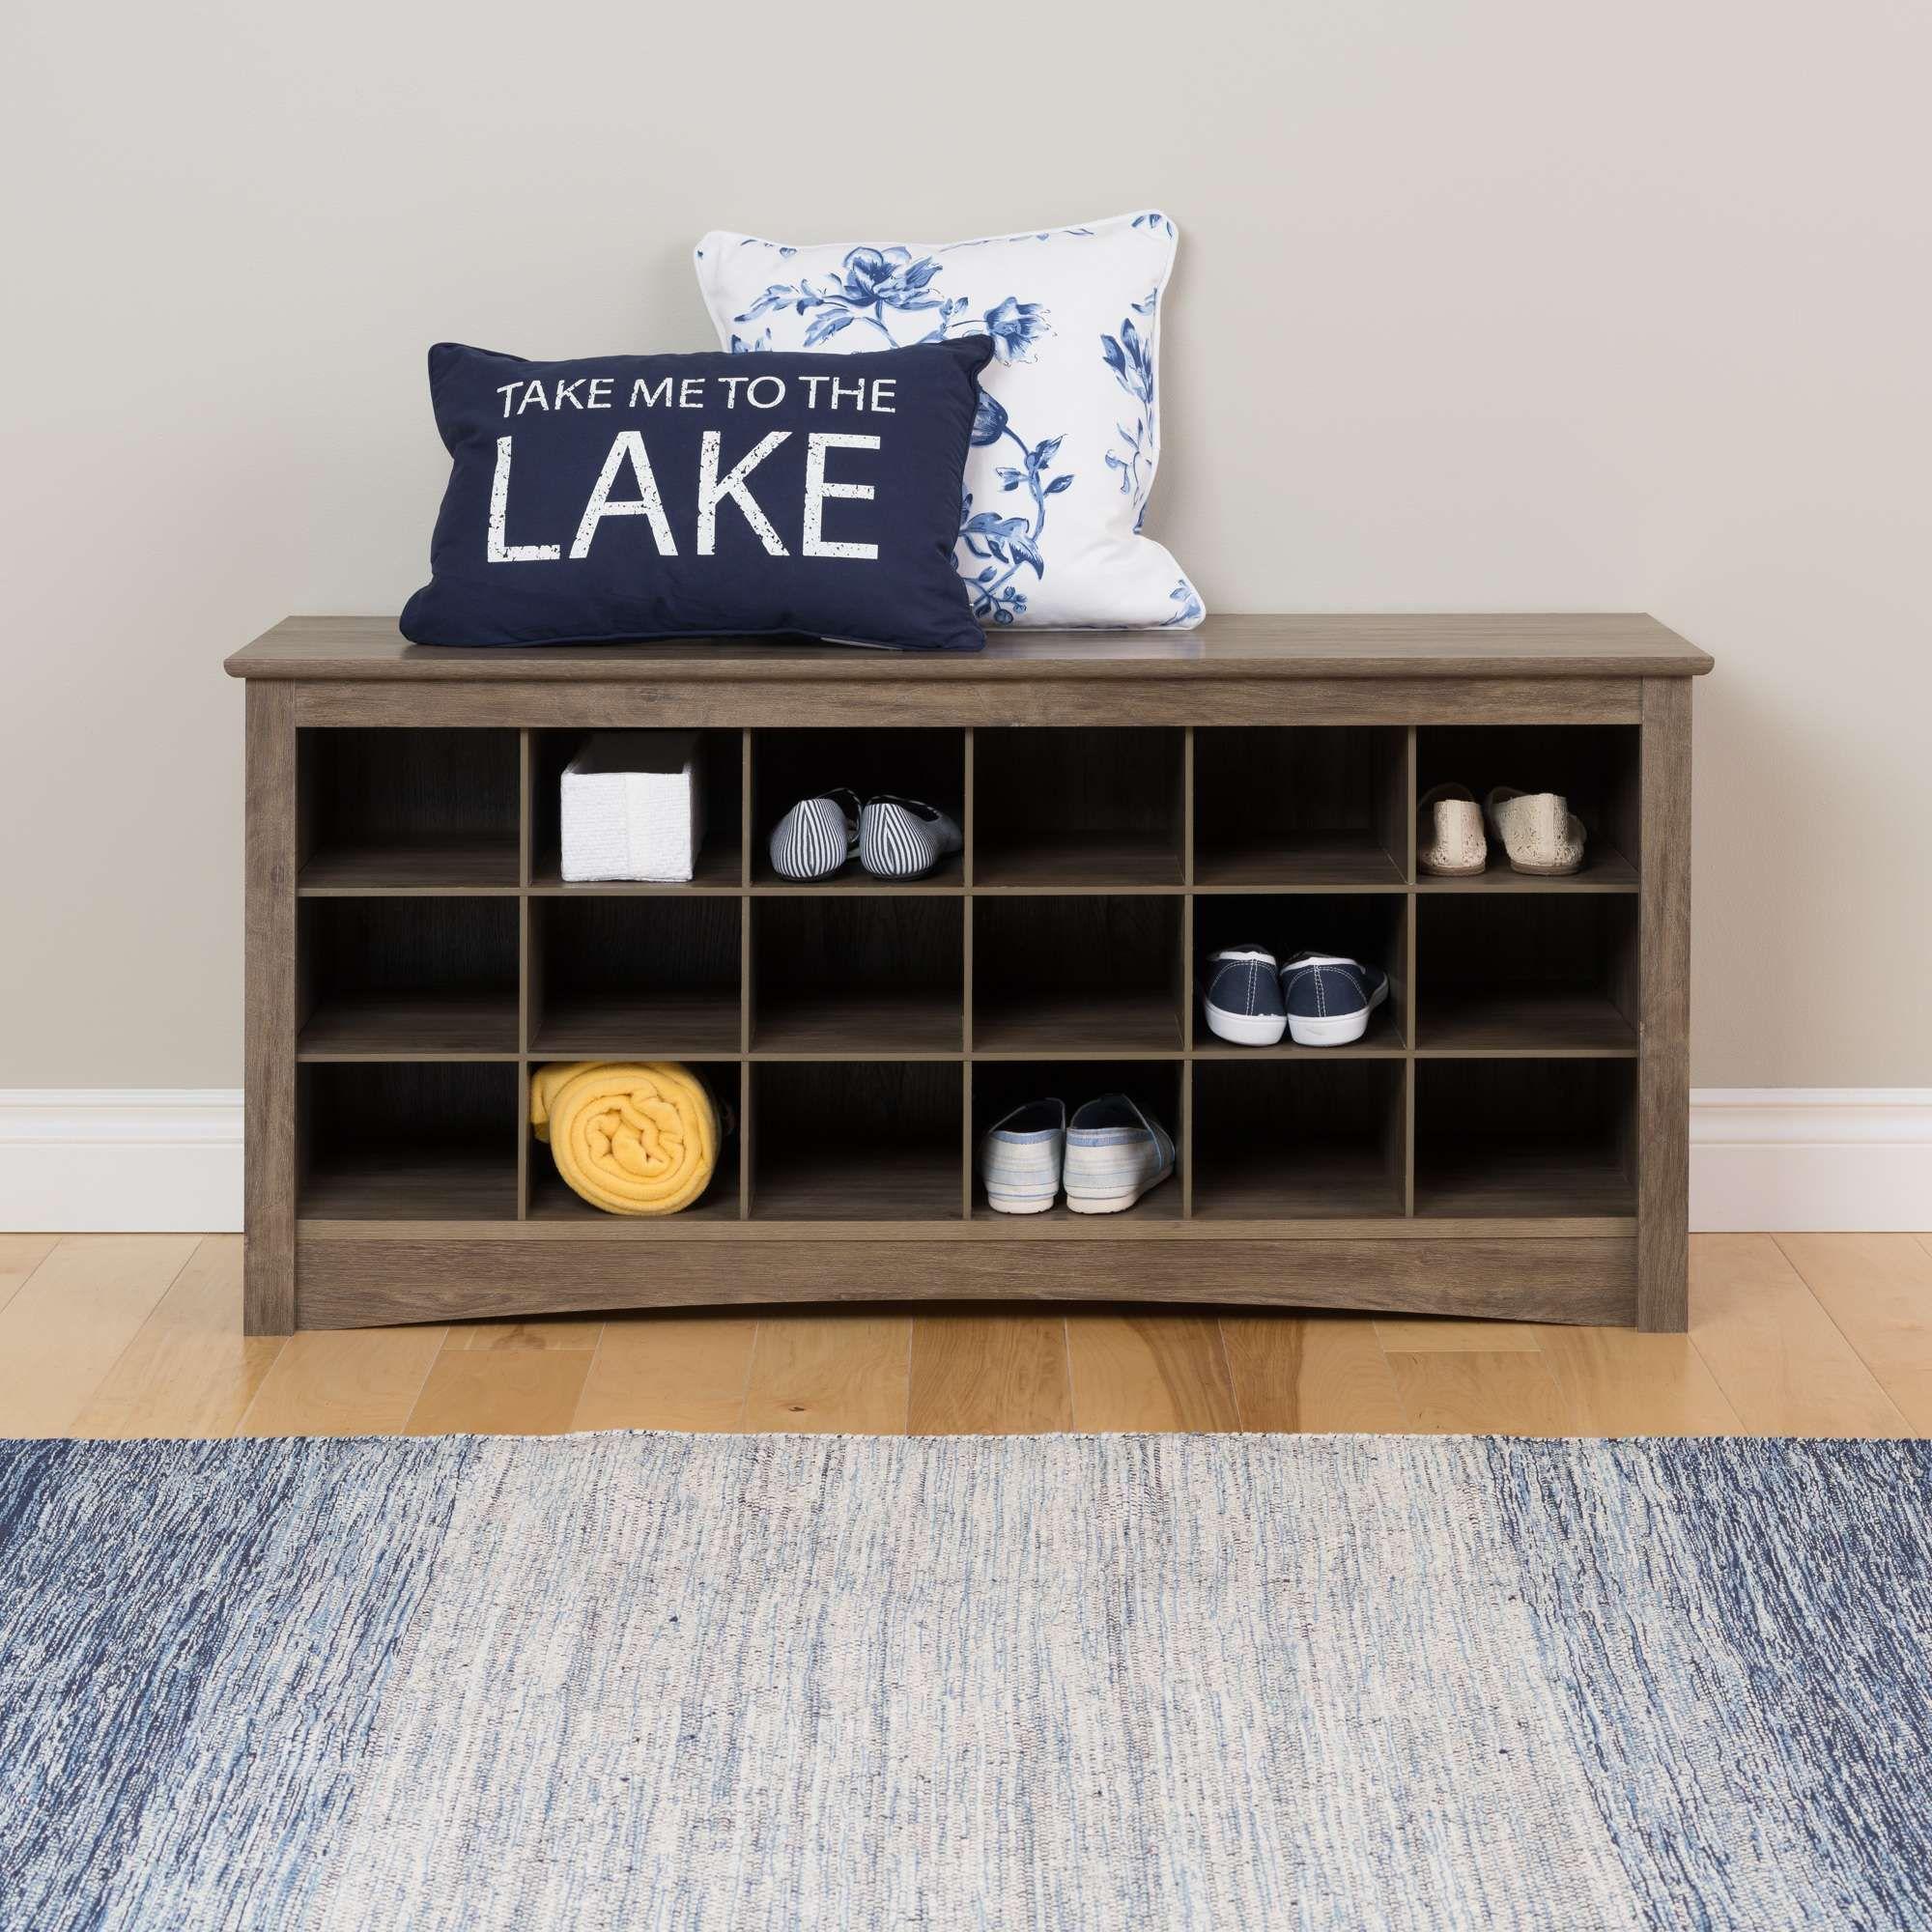 Terrific Prepac Dss 4824 Mud Room In 2019 Shoe Storage Cubbie Evergreenethics Interior Chair Design Evergreenethicsorg